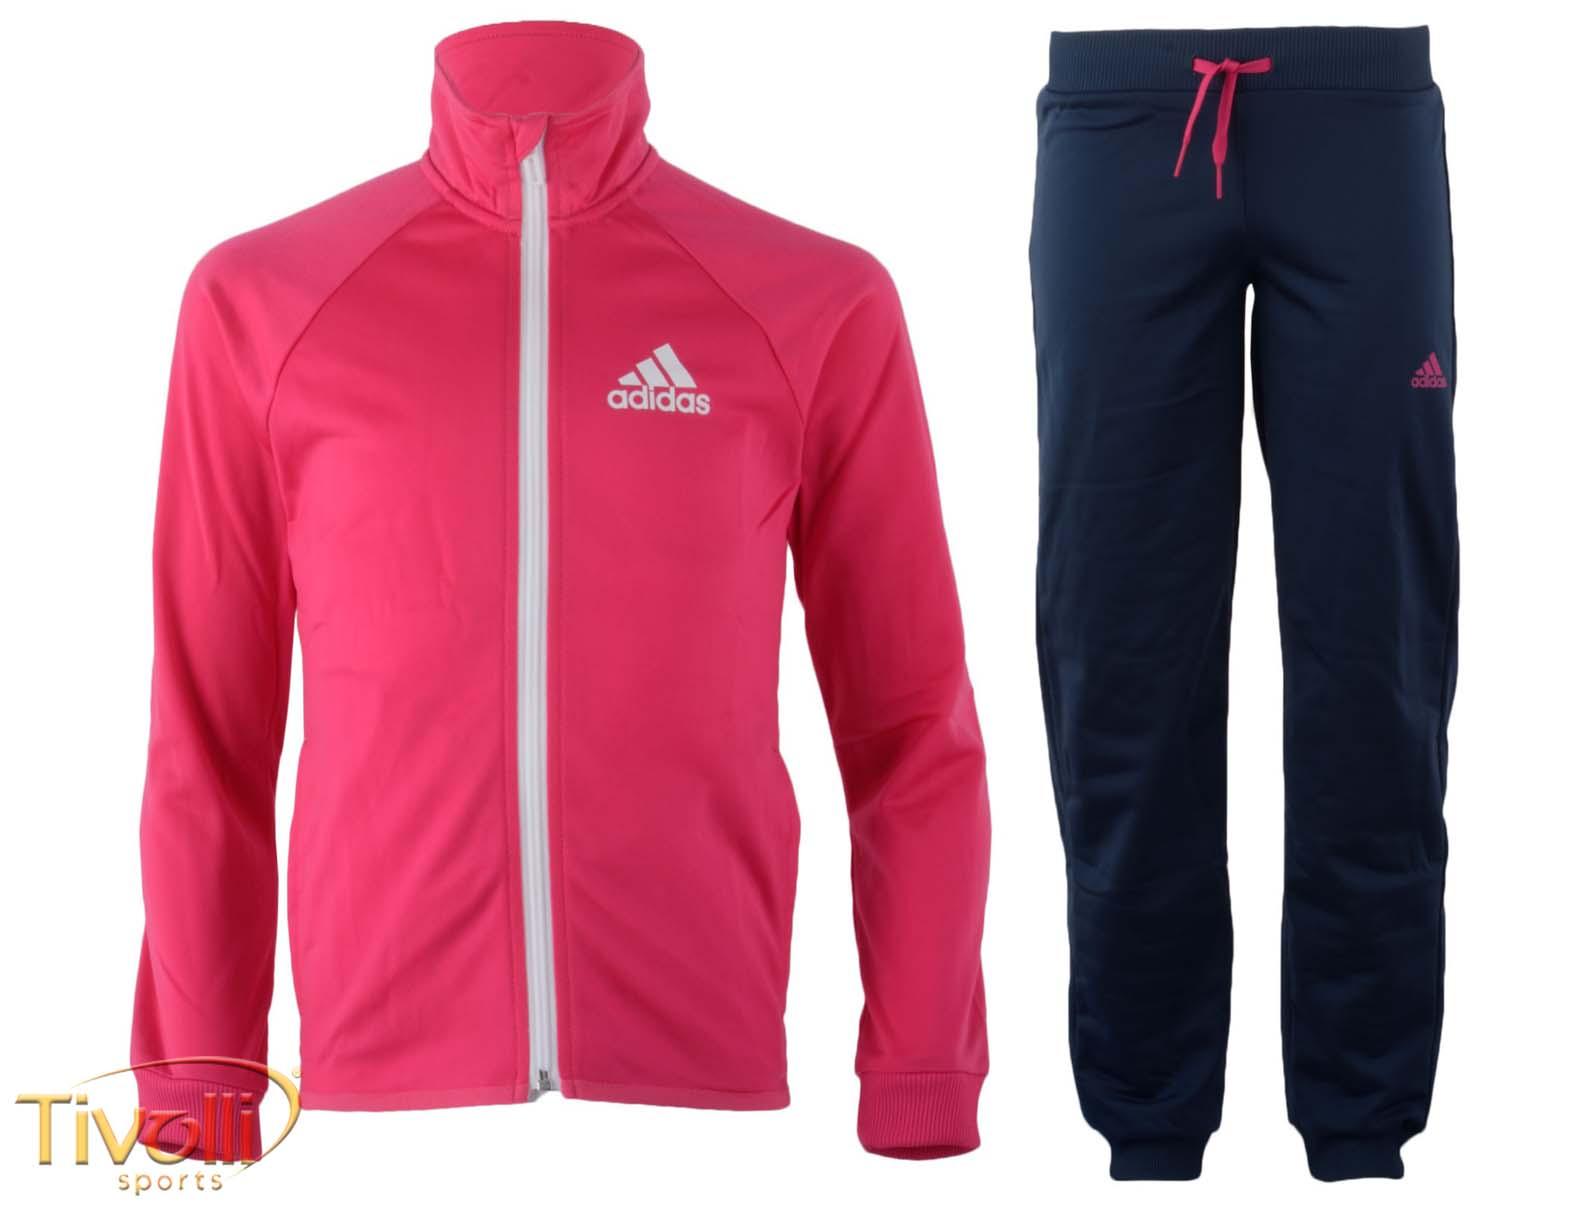 50187acf79c Agasalho Adidas Entry TS Infantil